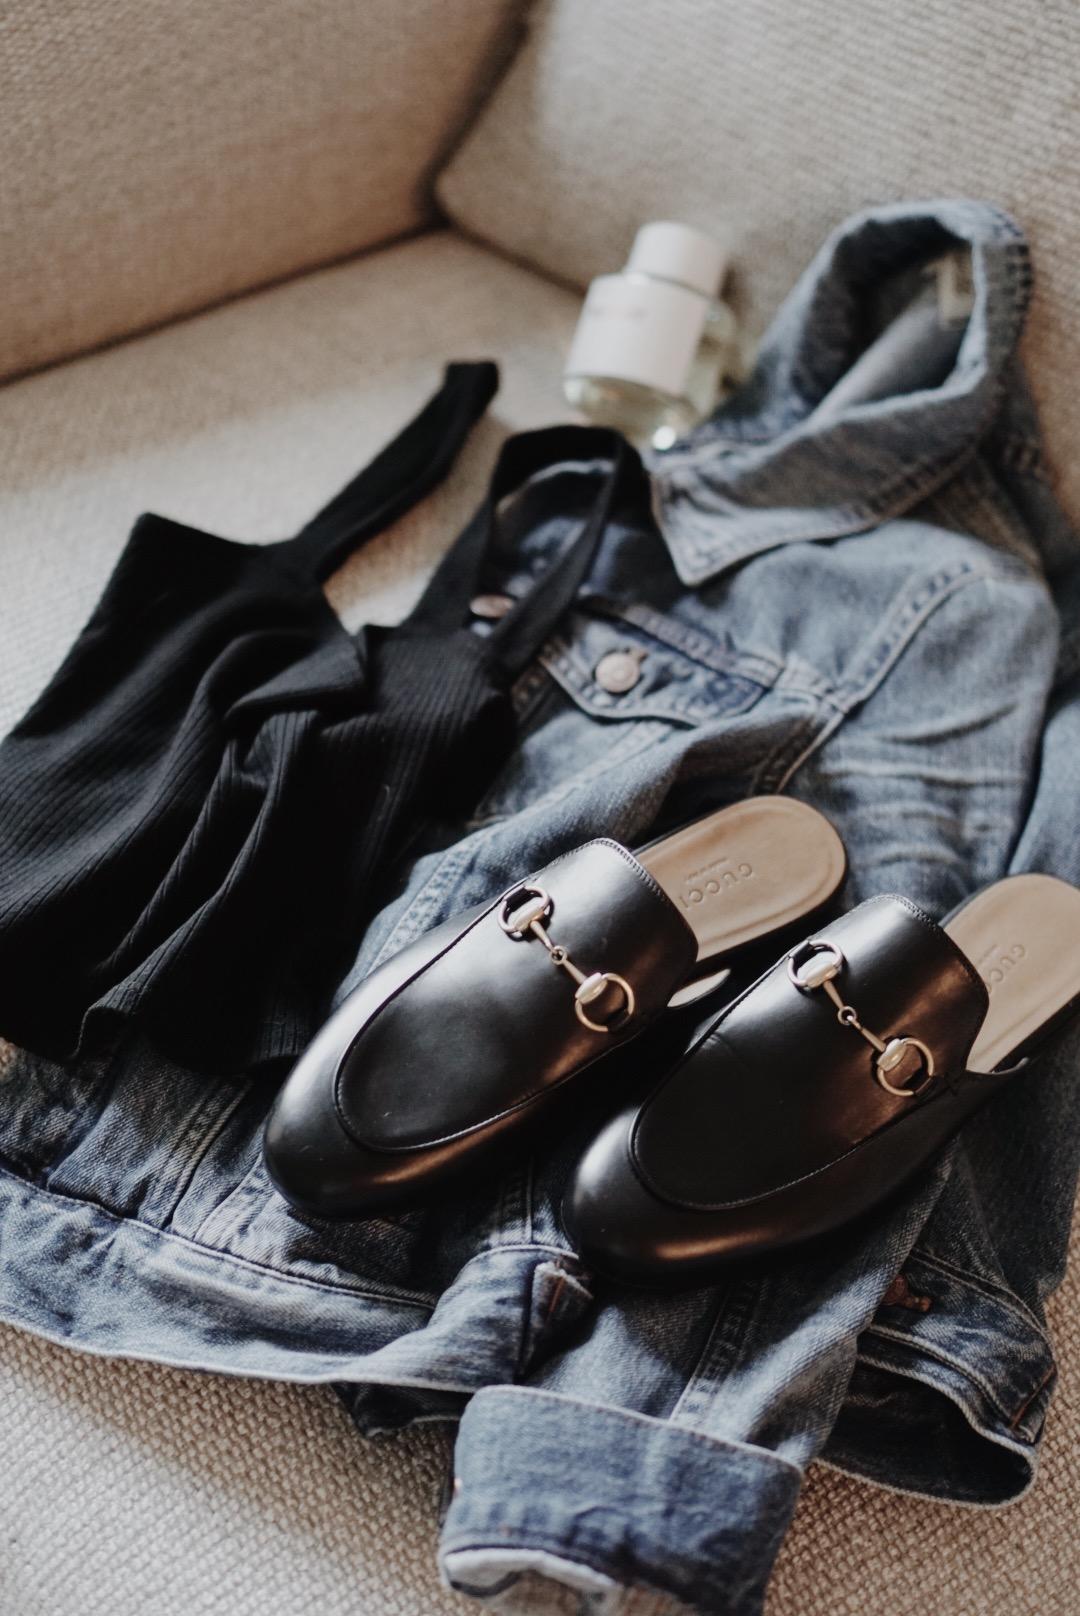 Summer Wardrobe Essentials Gucci Princetown, Madewell Jean Jacket Pinter Wash, The Reformation